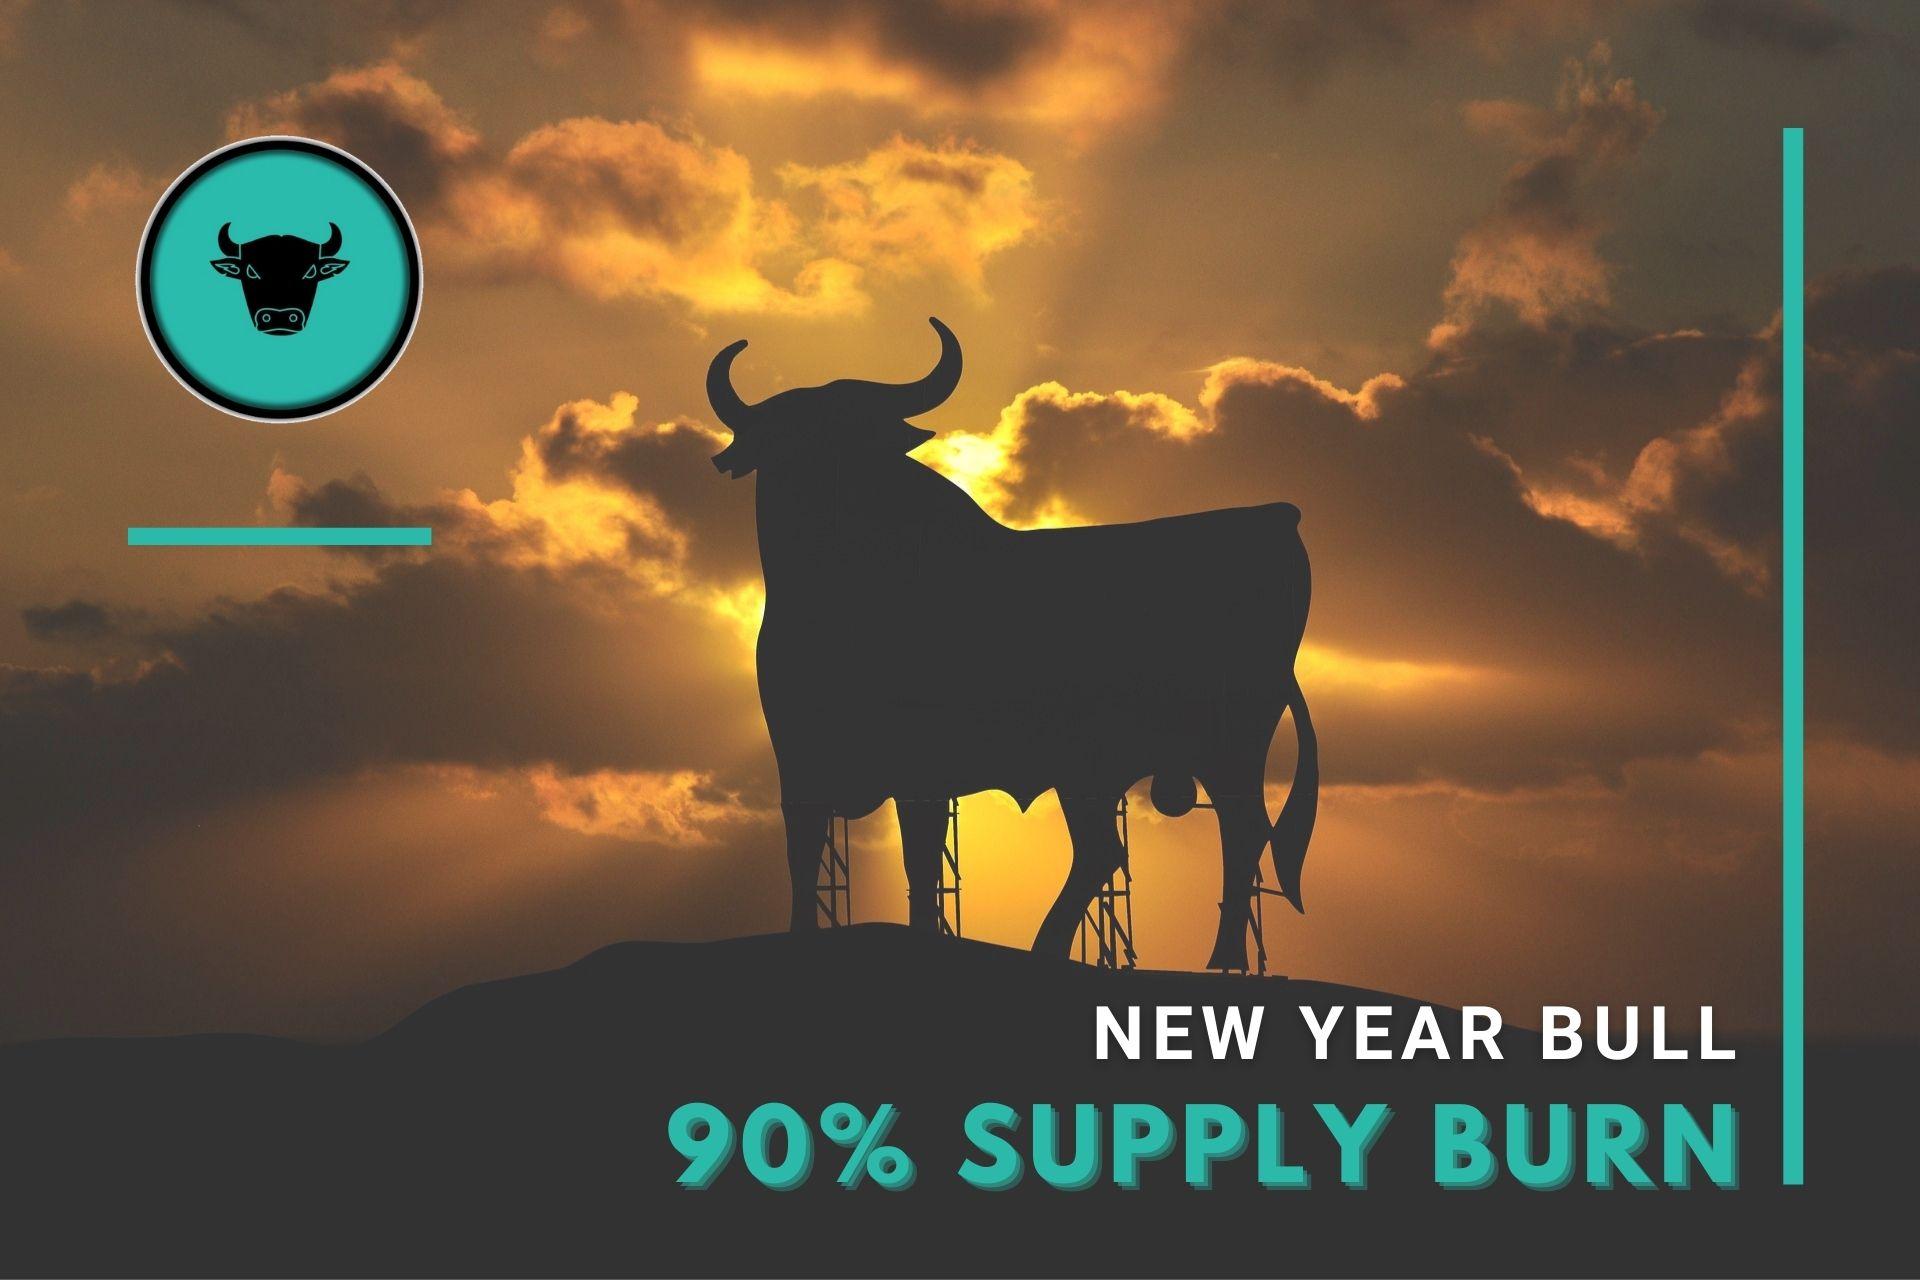 New Year Bull